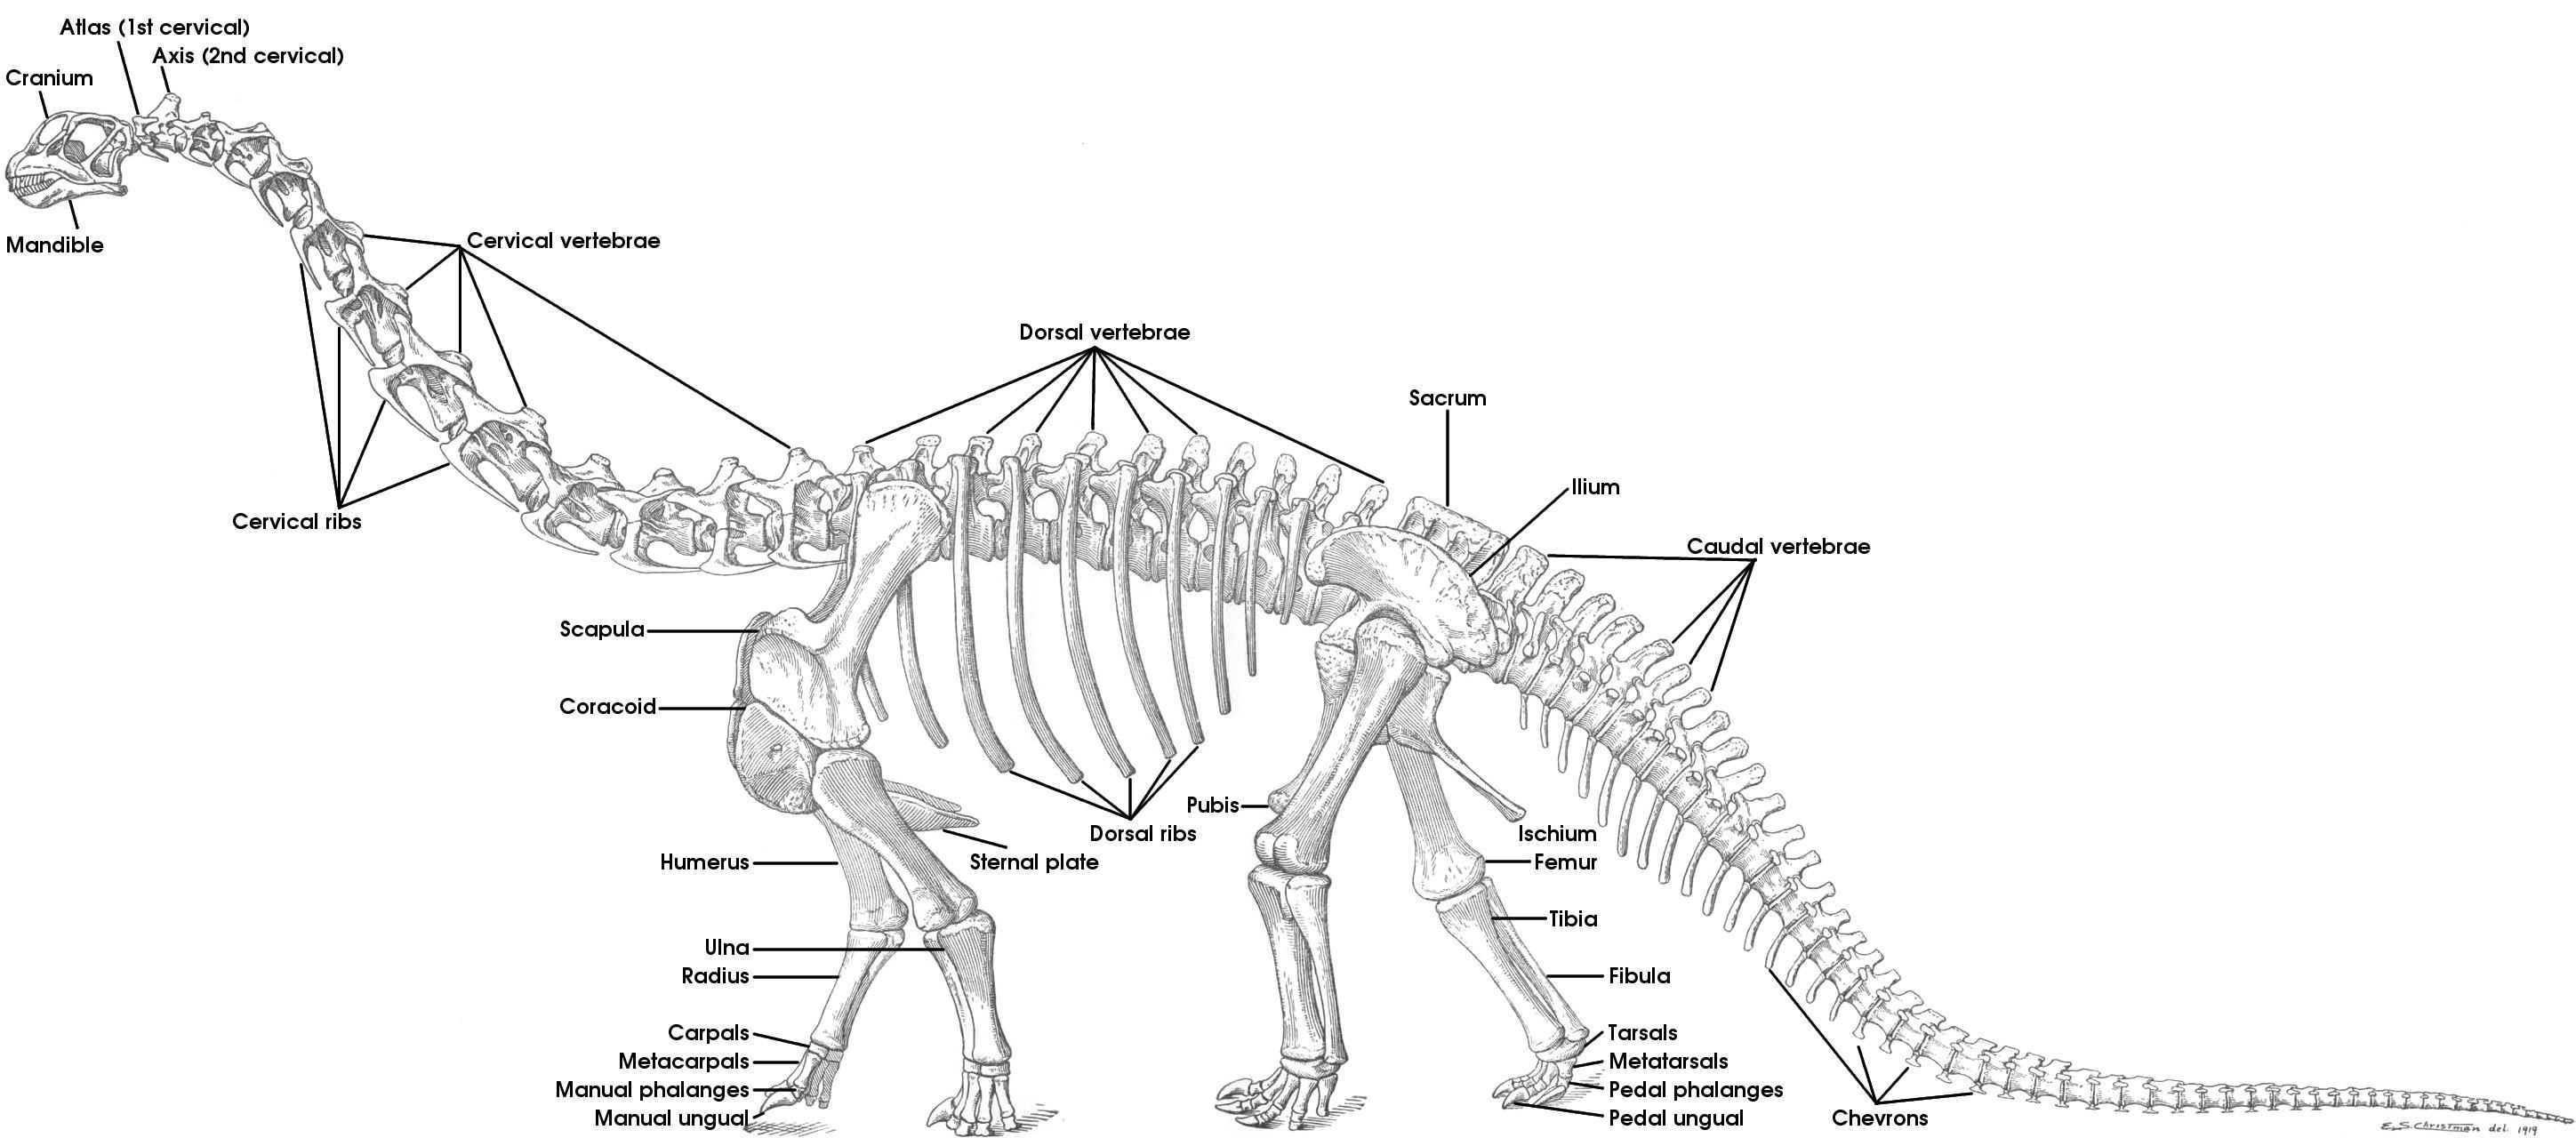 Dinosaur Skeleton Labeled